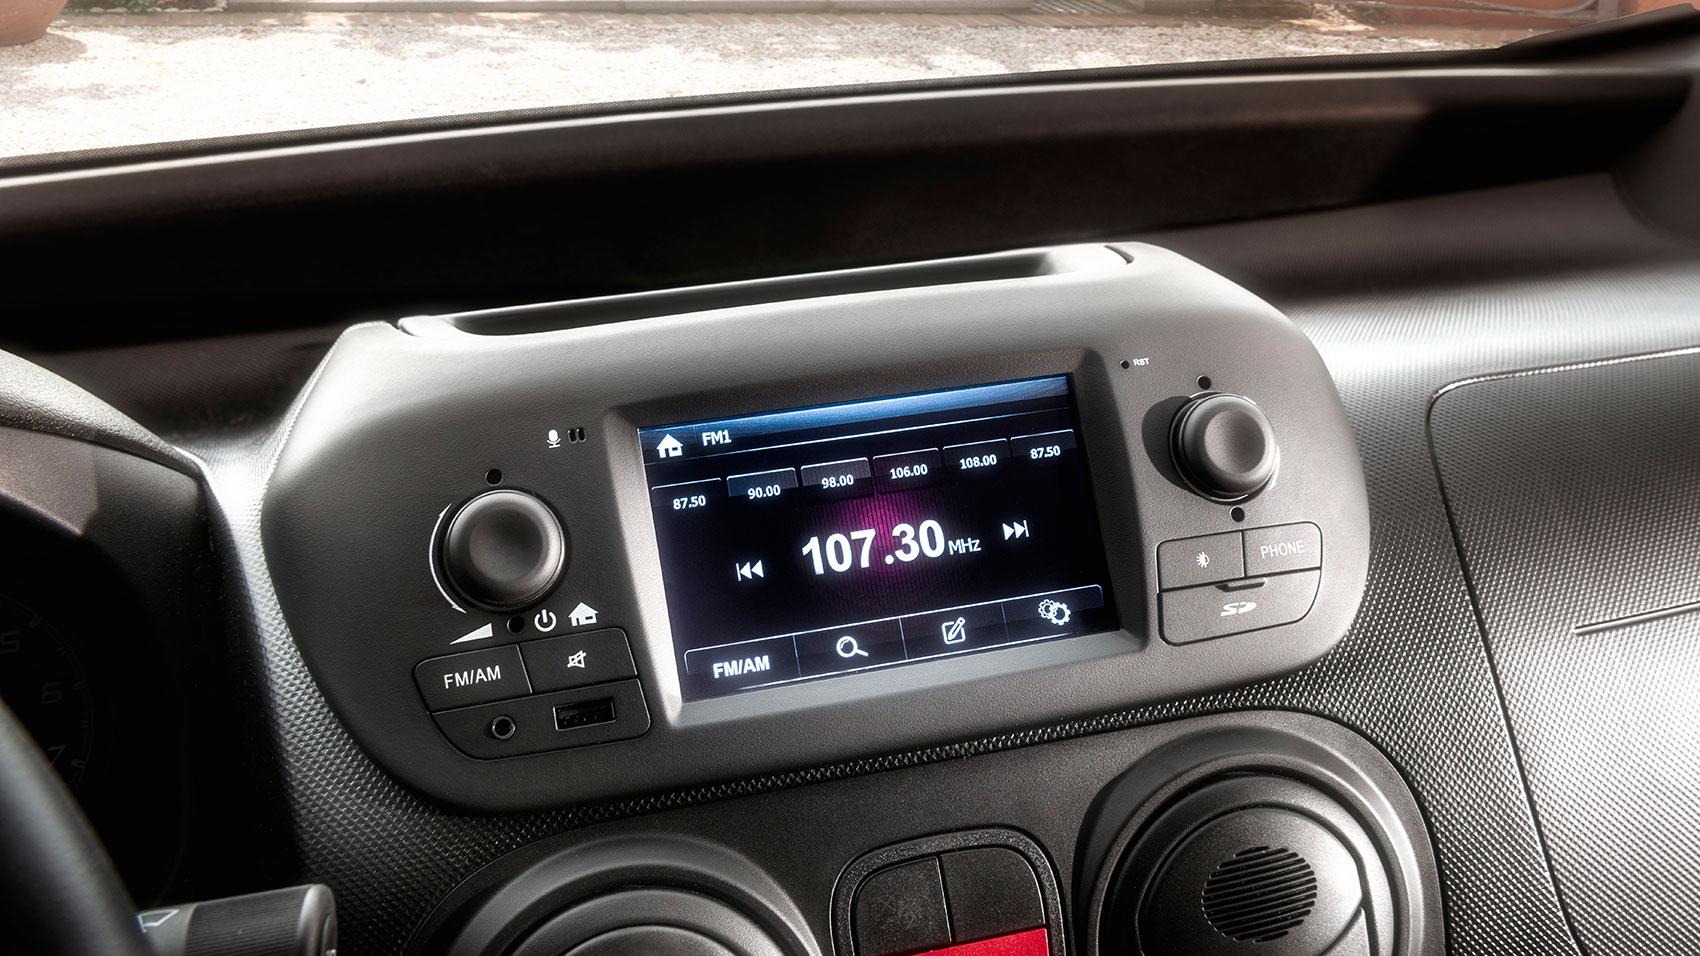 Fiat Fiorino Infotainment-System